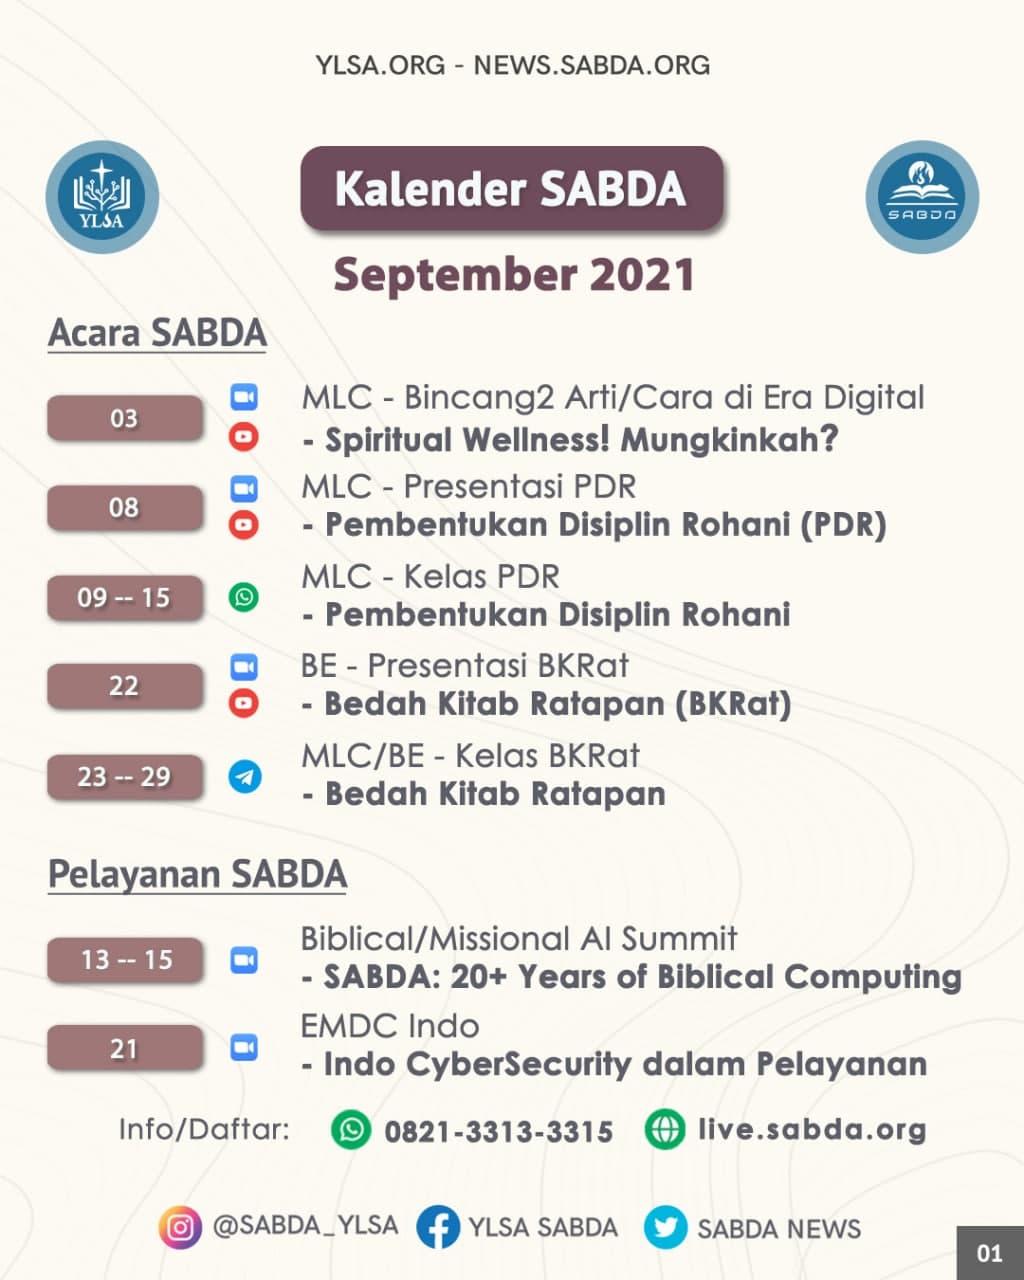 Kalender acara/pelayanan YLSA selama September 2021.